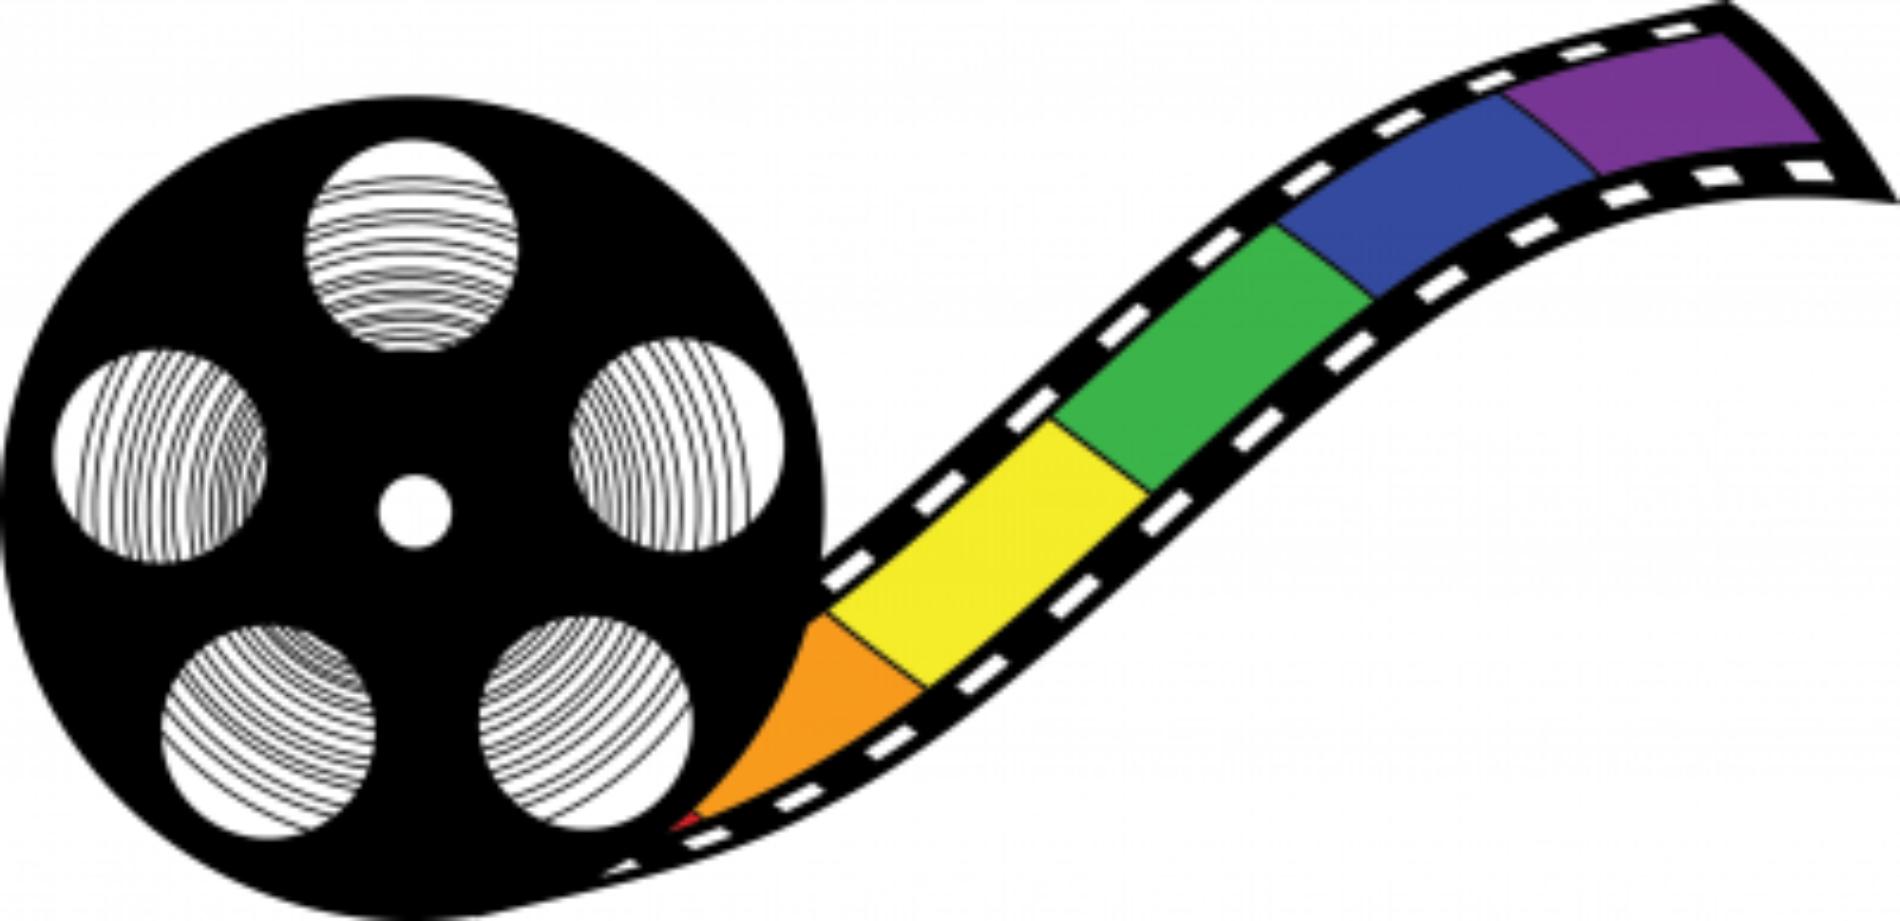 Top Benchmark LGBT Films That Got People Talking